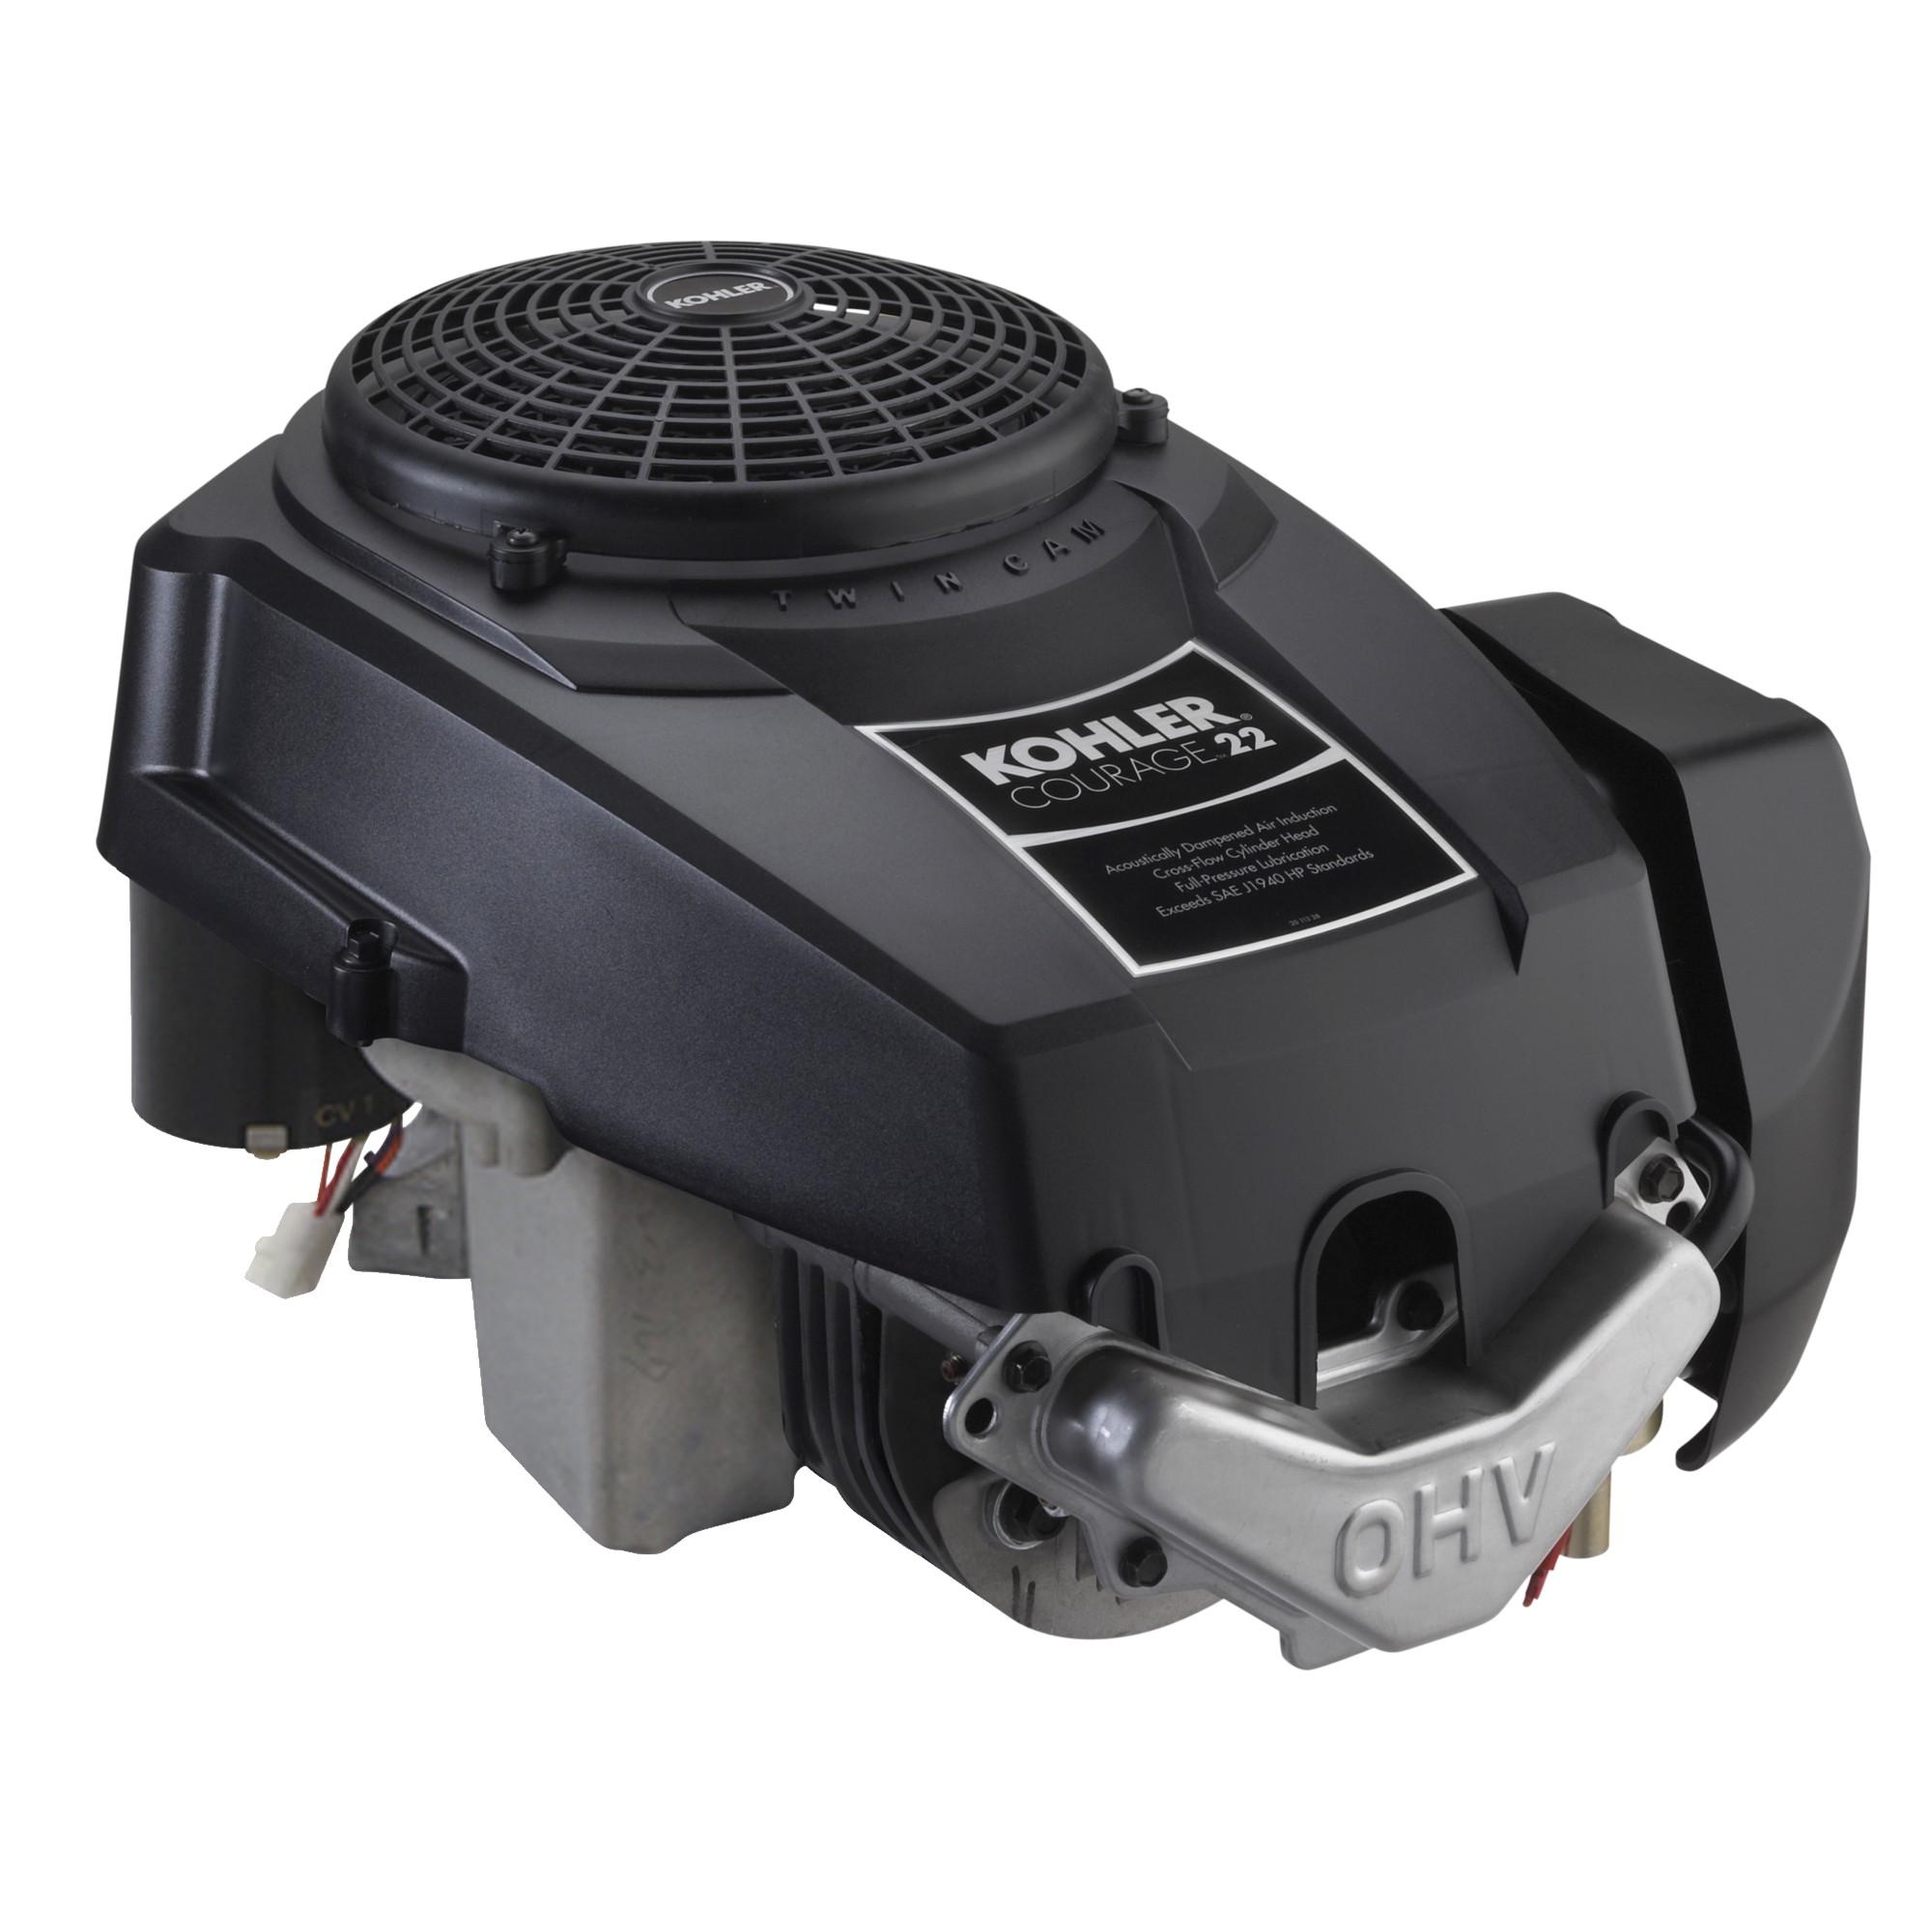 22 Hp Kohler Engine Diagram Archive Of Automotive Wiring Engines Sv620 Courage Product Detail Rh Kohlerengines Com For